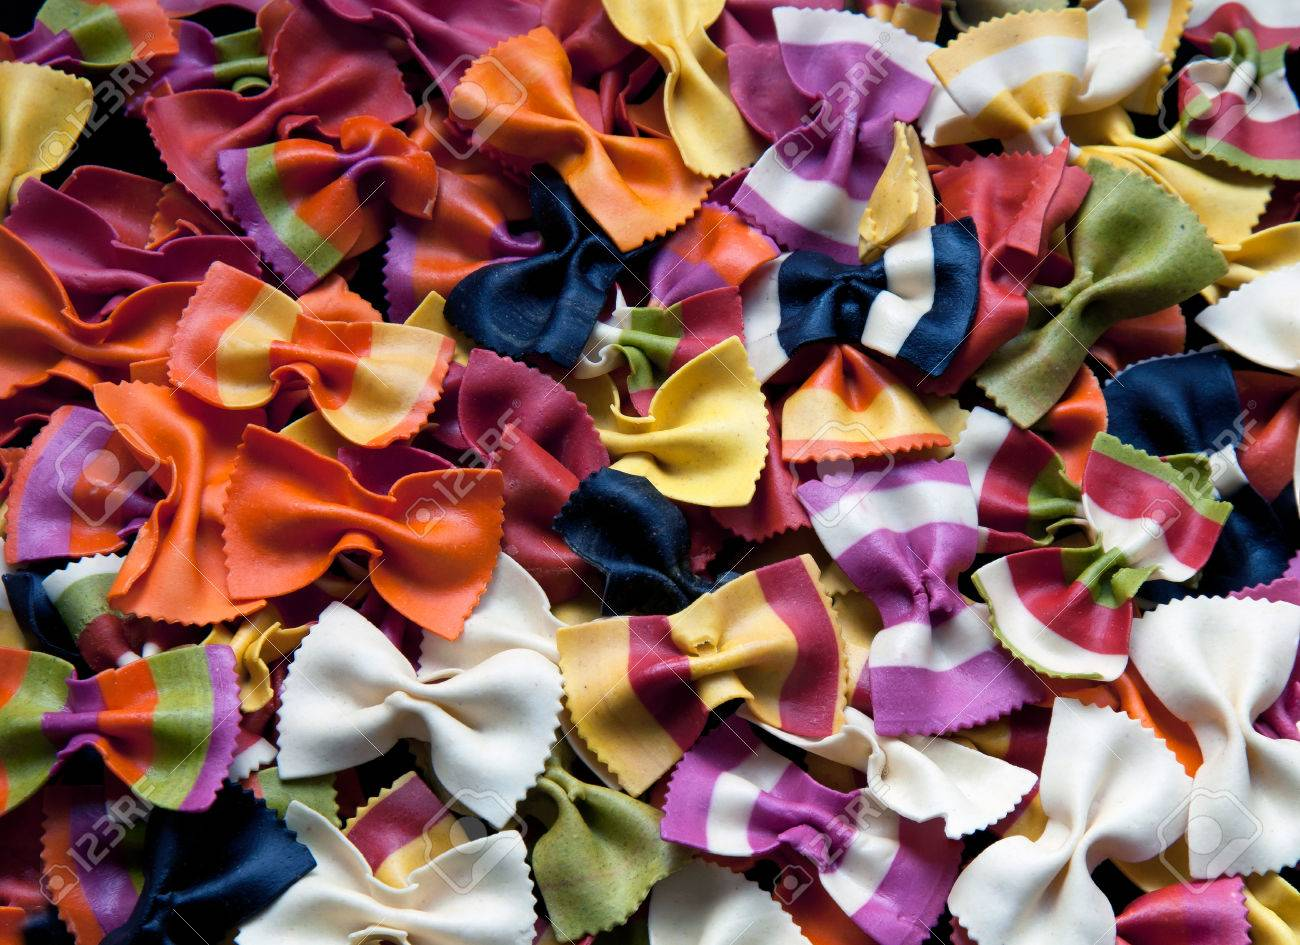 Background of multicolor italian bowtie farfalle pasta - 34321591